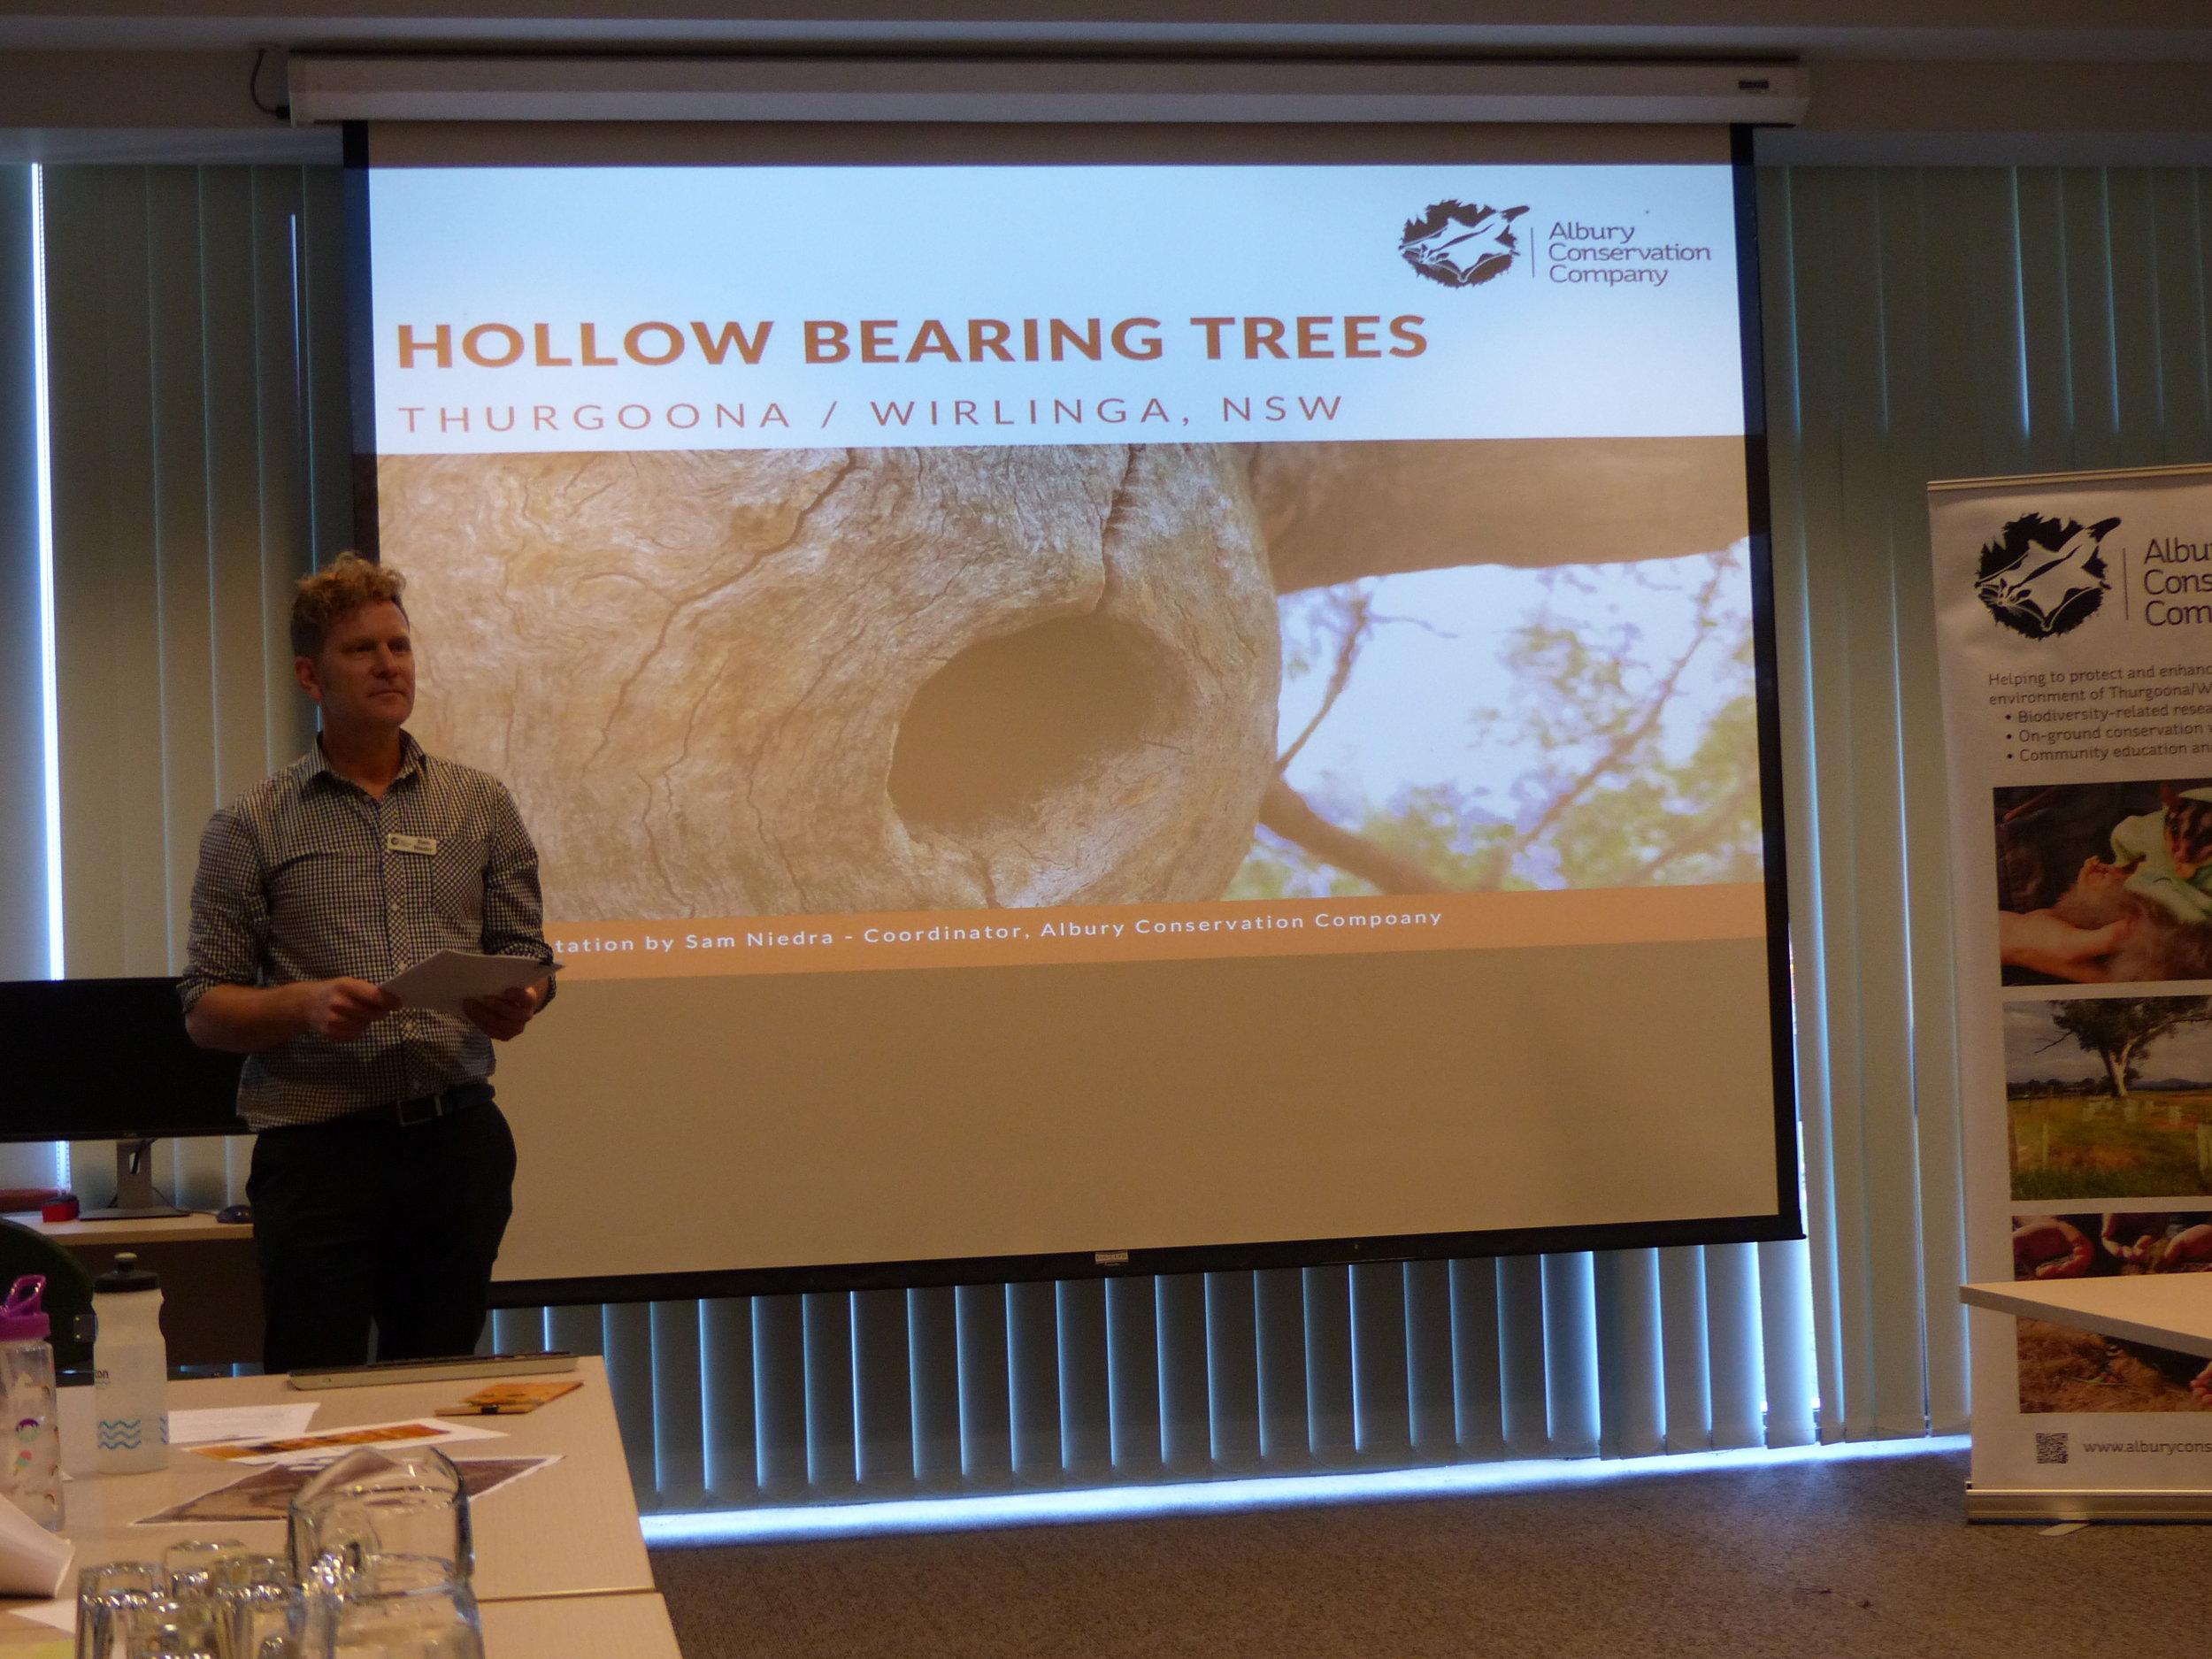 Hollow bearing tree Workshop_Presentation_Sam Niedra_Albury Conservation Company_28thFeb2018.JPG